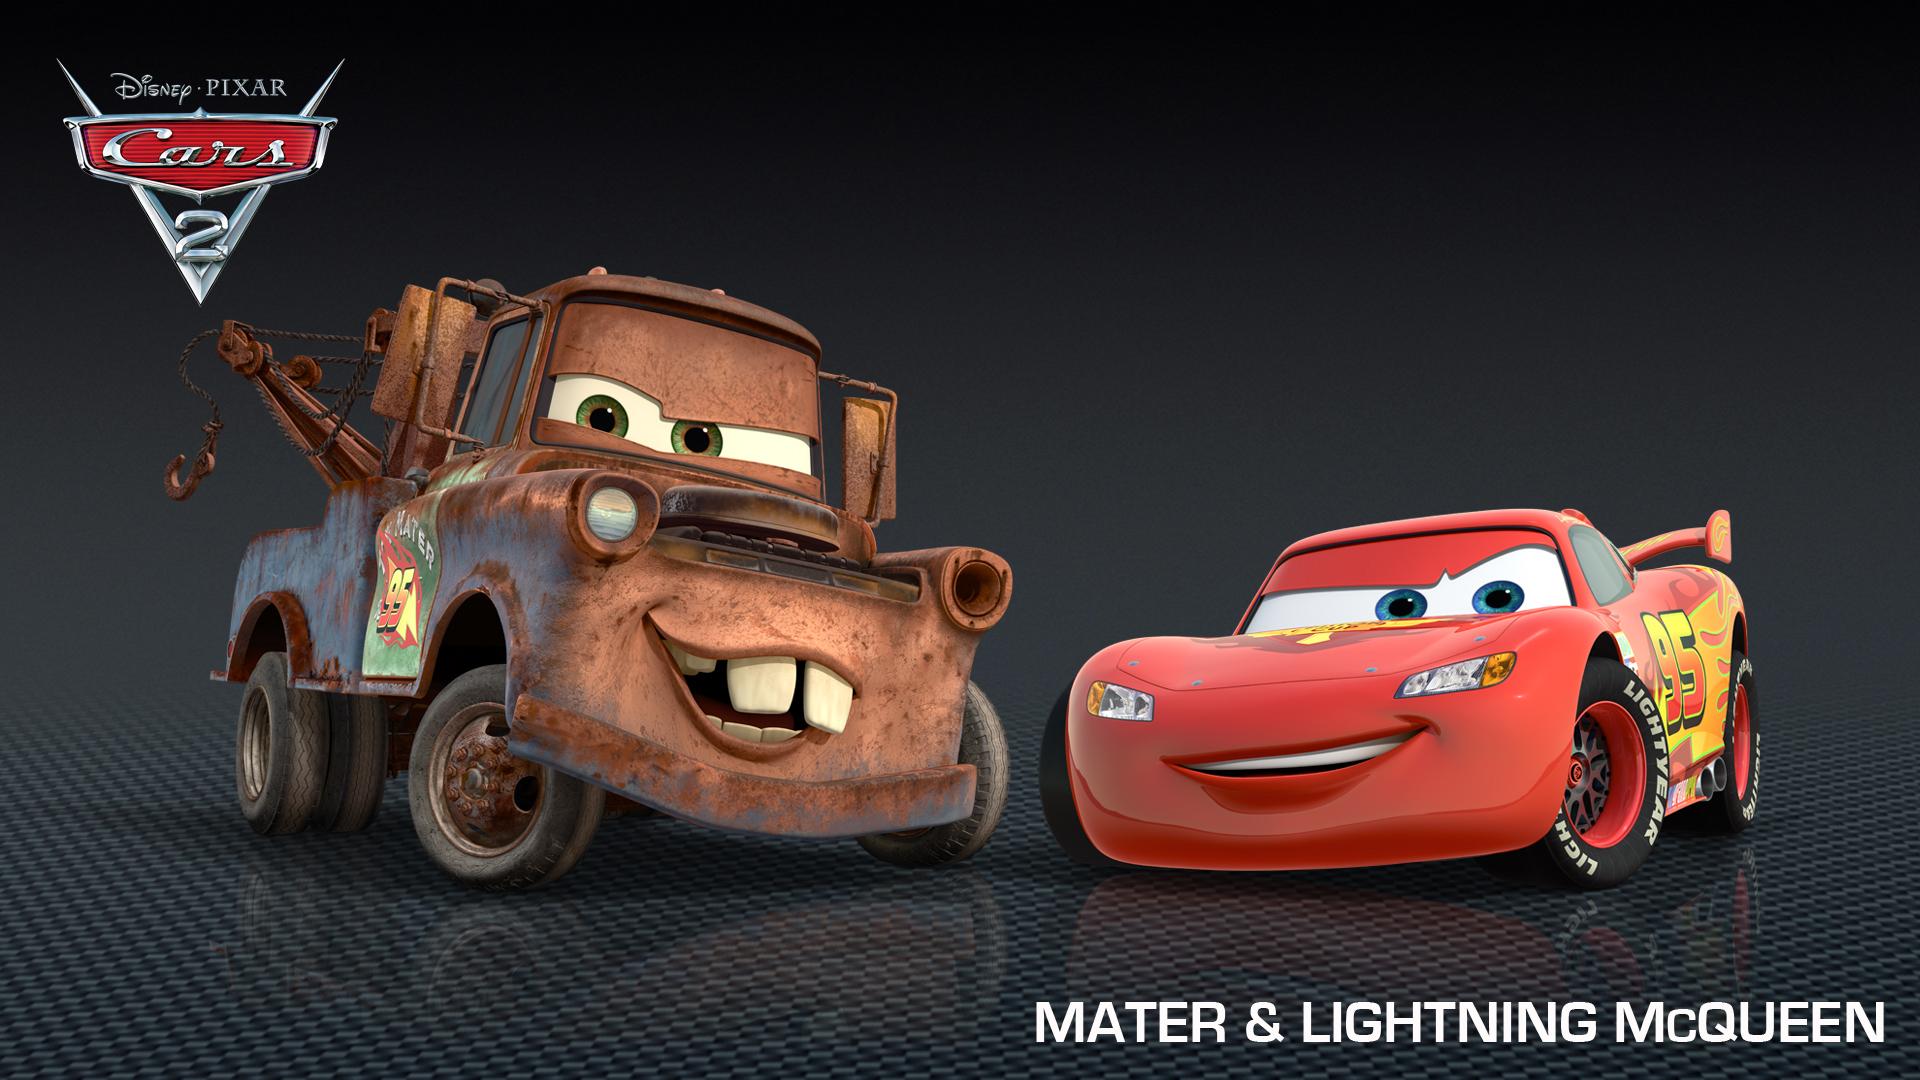 Download mater lightning mcqueen from cars 2 HD wallpaper 1920x1080